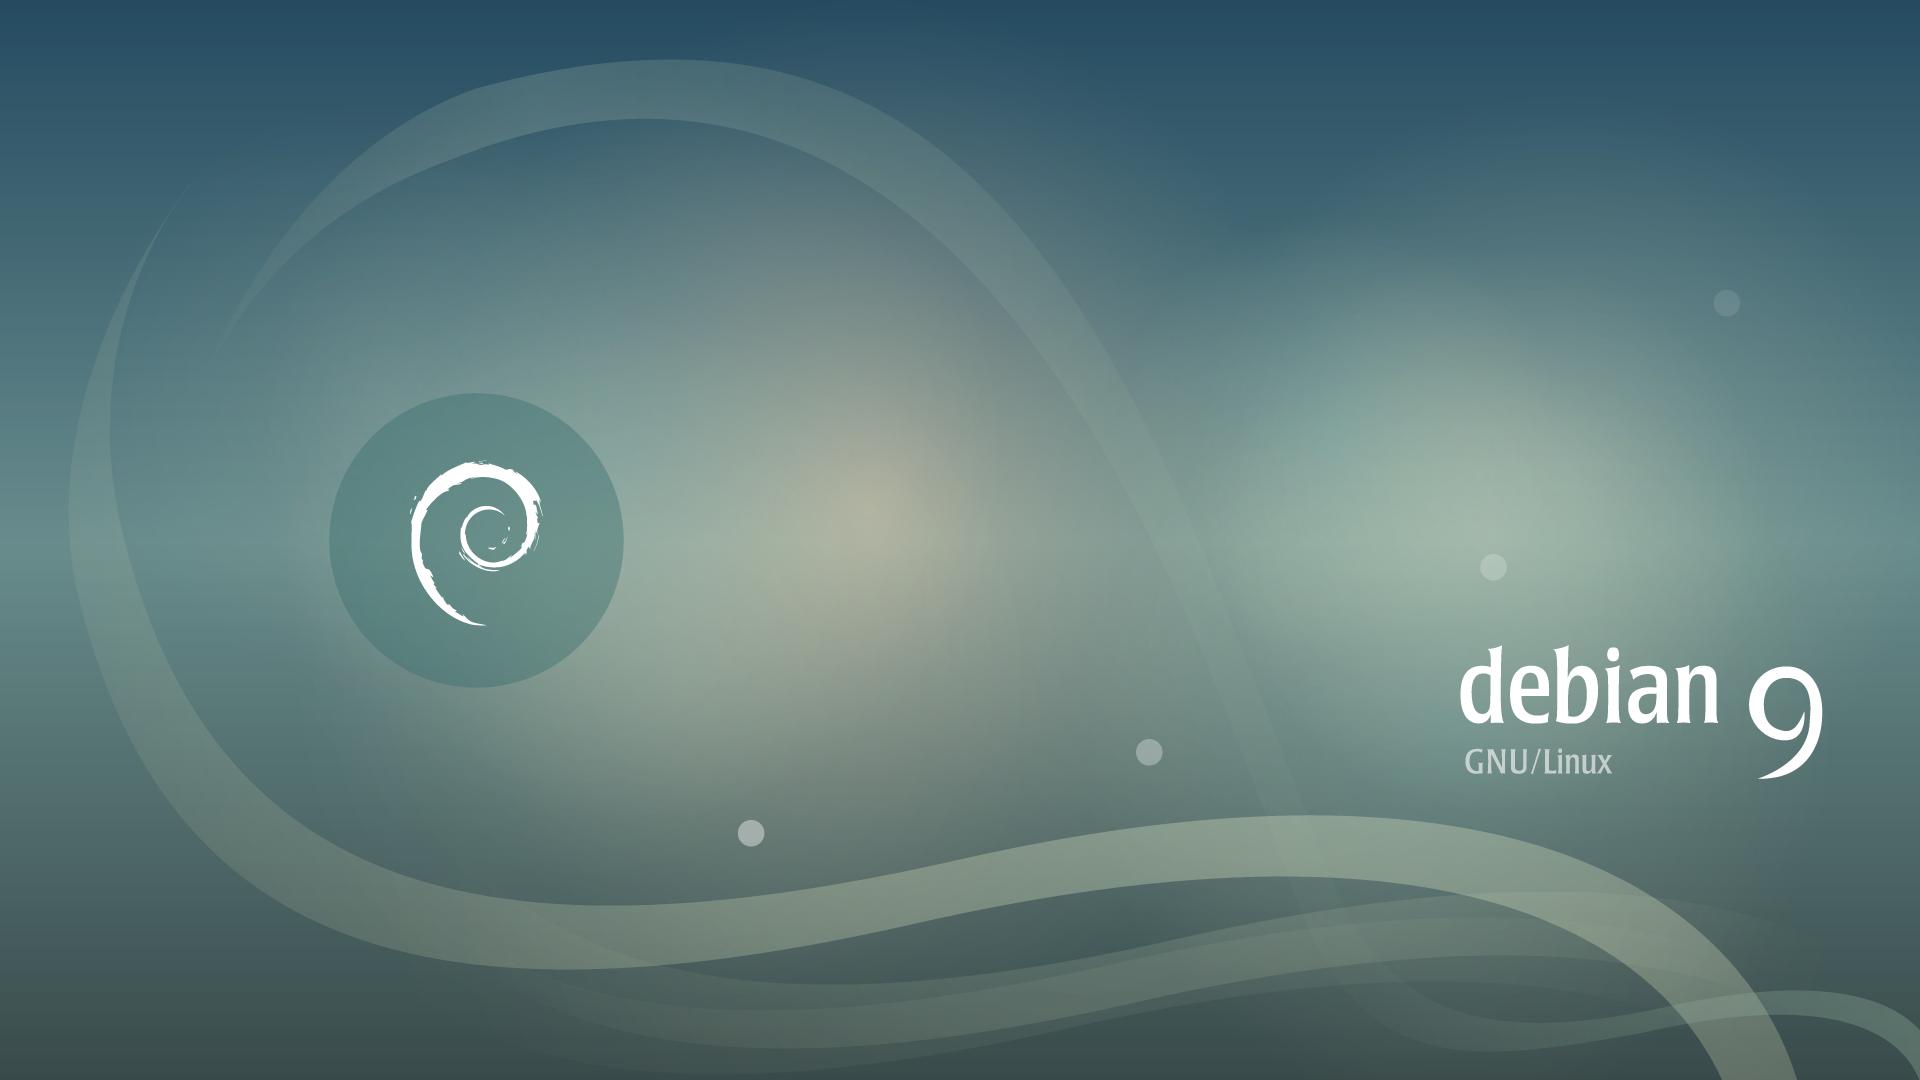 Debian-9-1-Stretch-Linux-background-default-picture